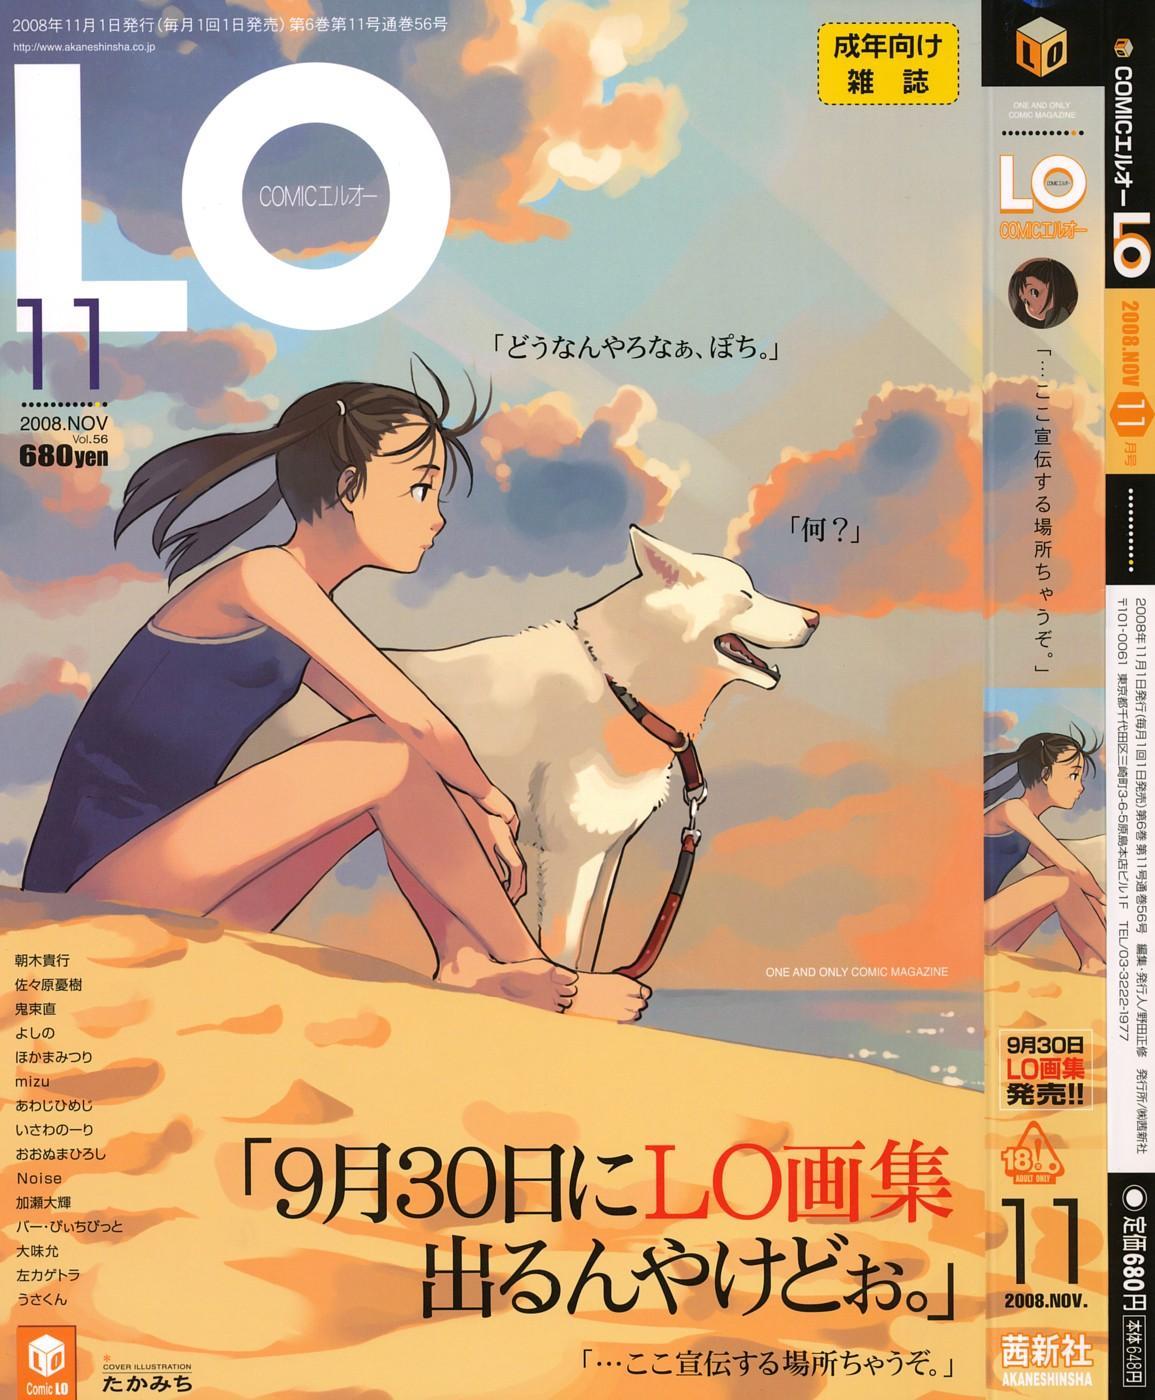 Comic LO 2008-11 Vol. 56 0